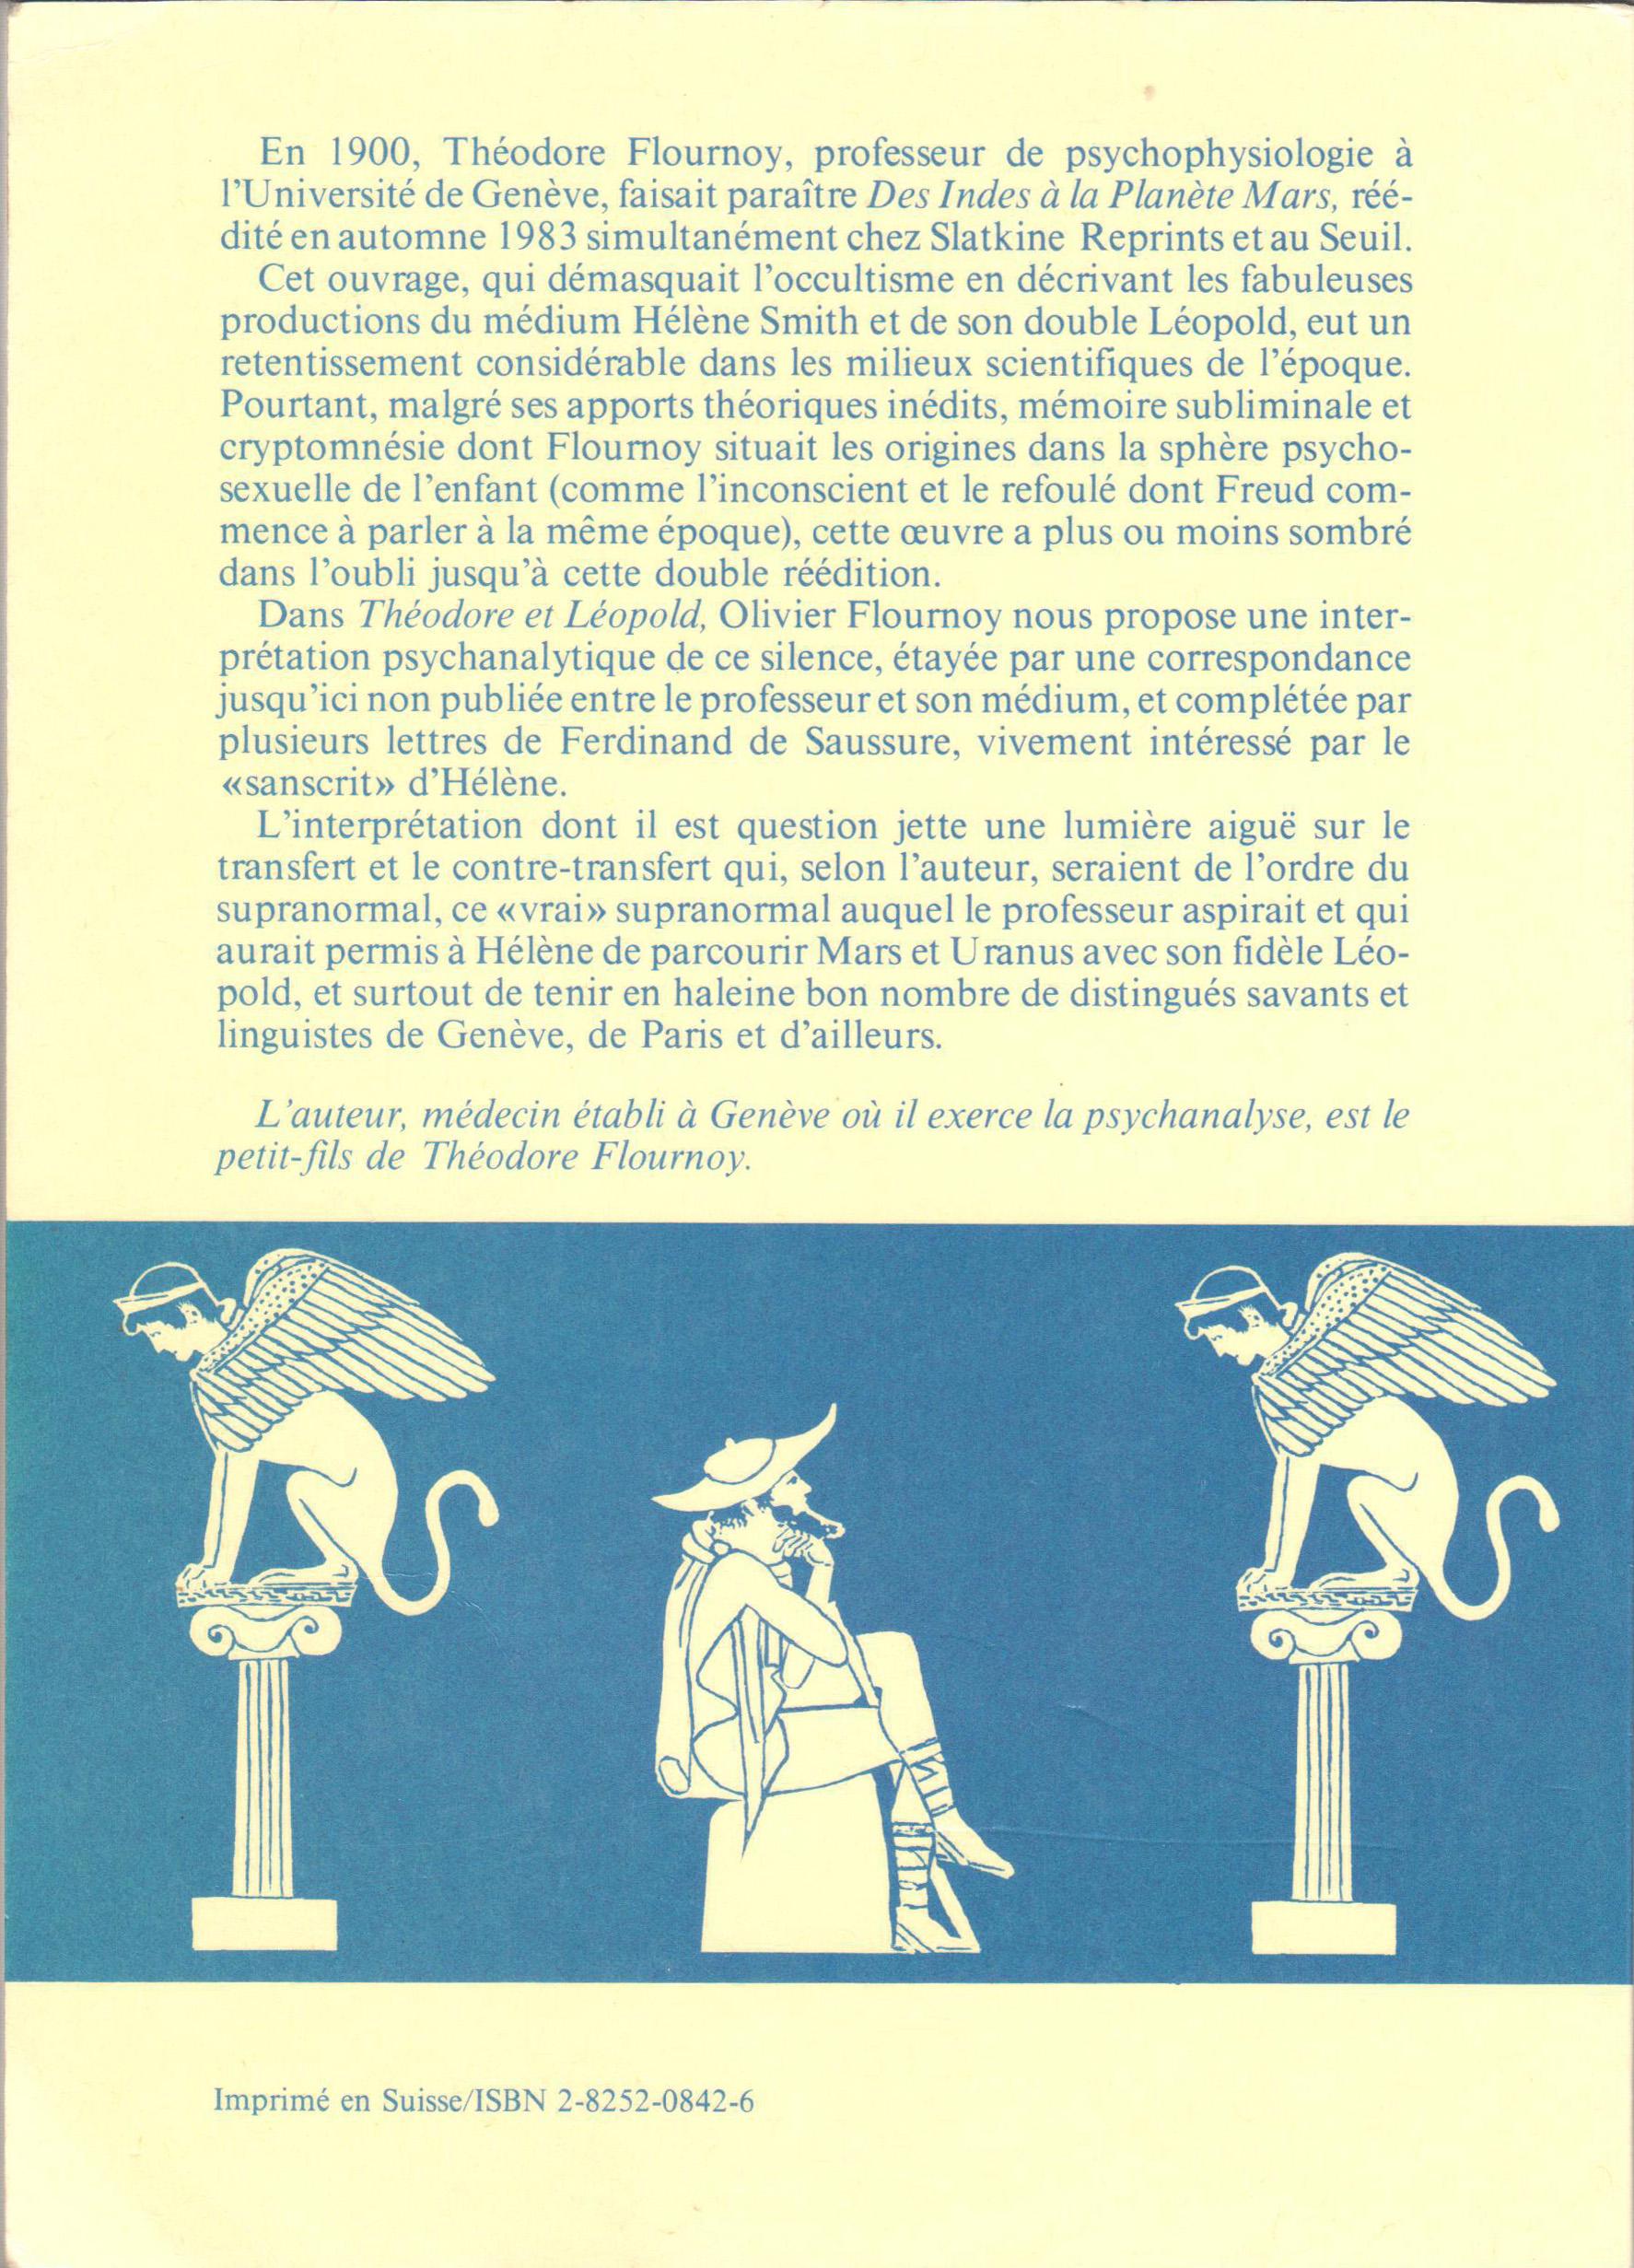 1986-Theodore_et_Leopold4eme